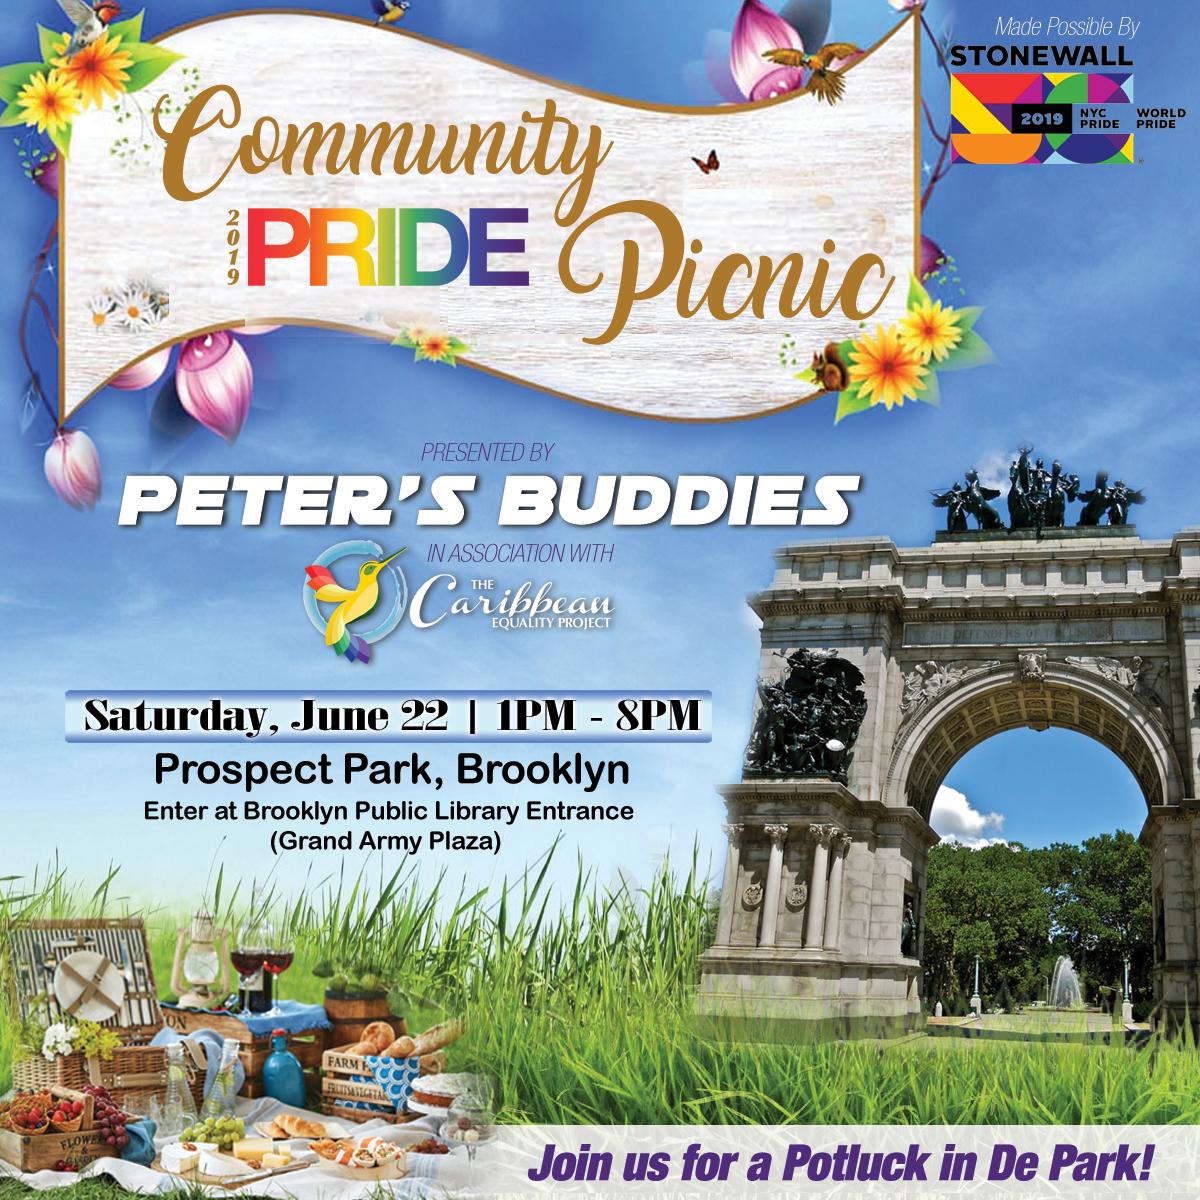 2019-Peter's-Buddies-Community-Pride-Picnic.jpg